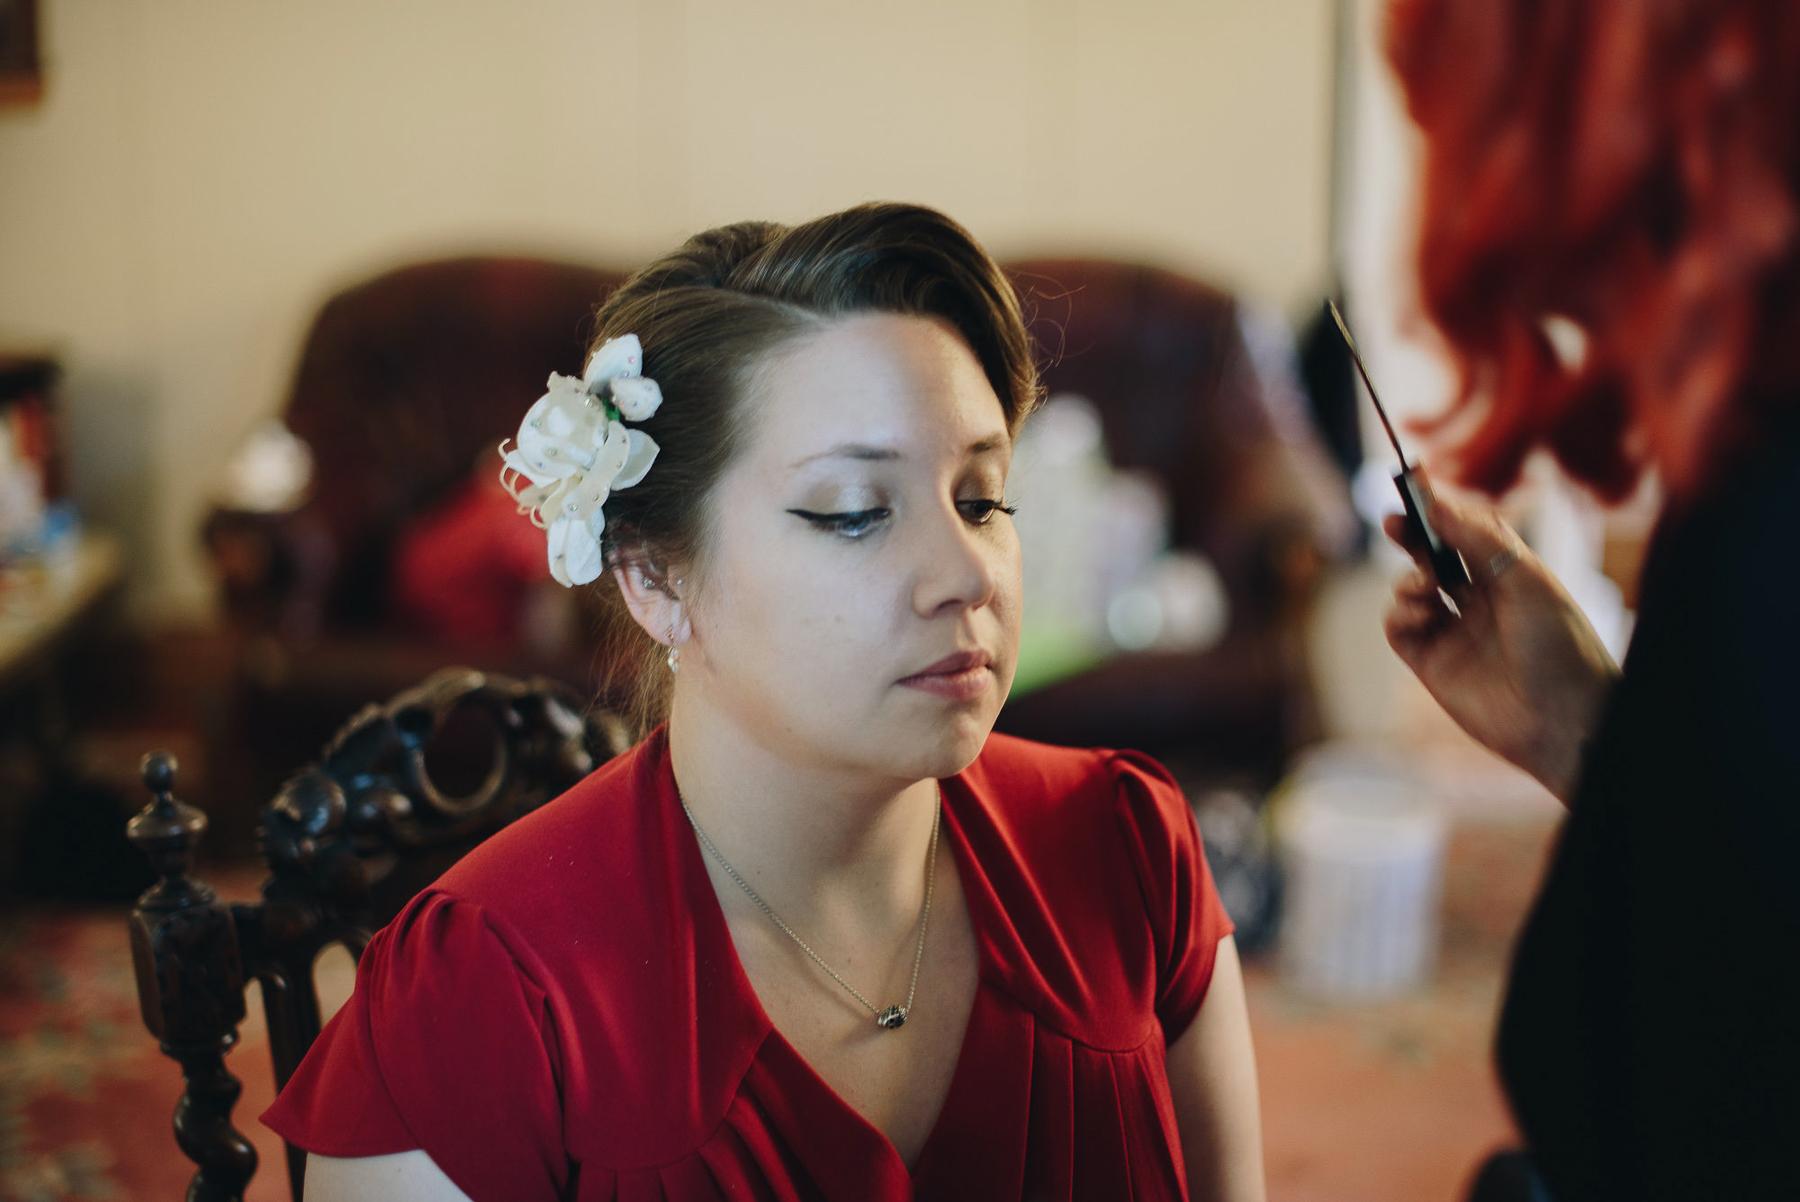 Wellbeing_Farm_Wedding_Photography_The_Pin-Up_Bride_Lara_Shaun-38.jpg